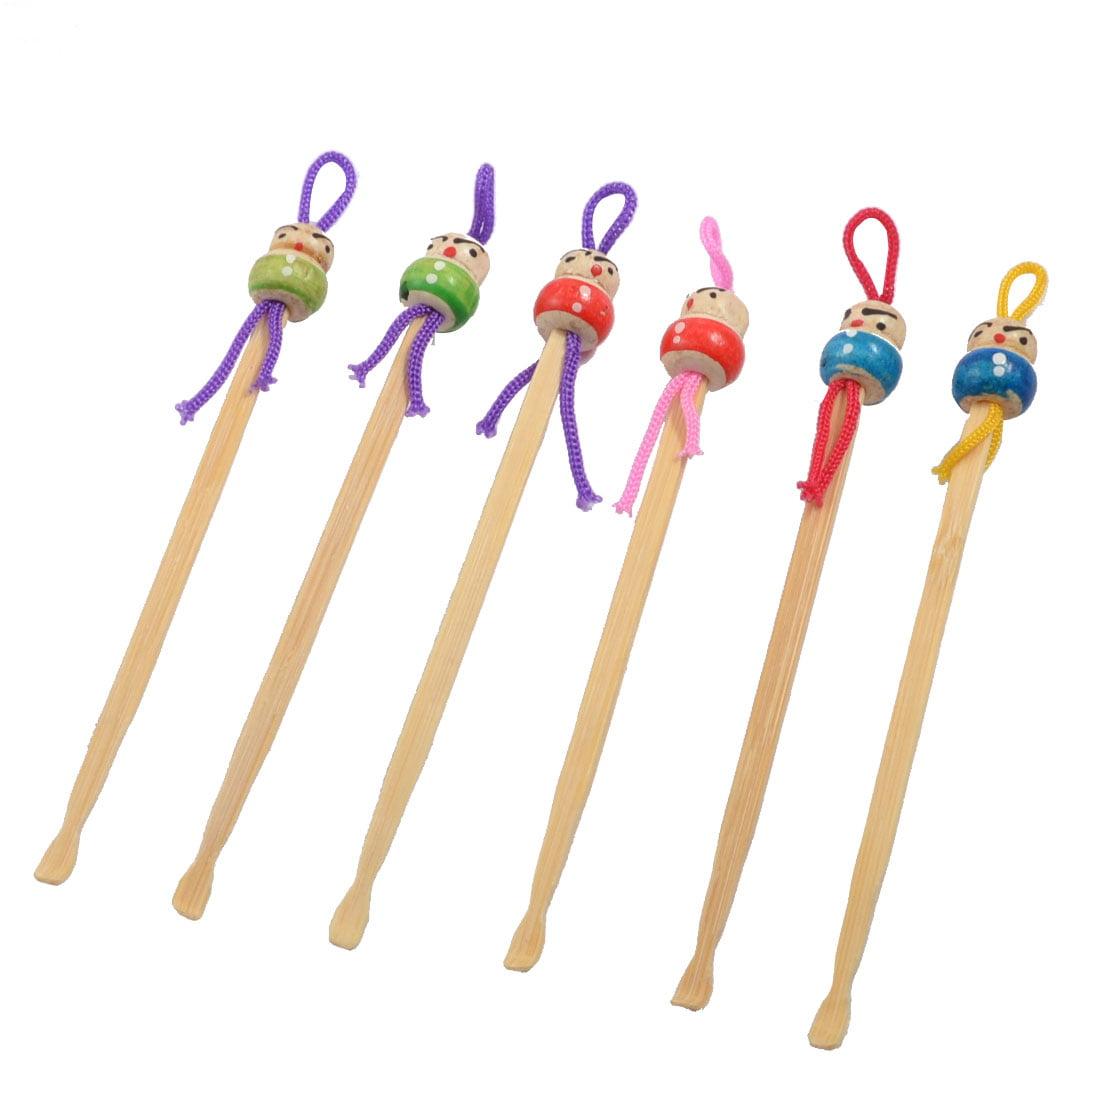 Bamboo Ear Pick Spoon Curette Ear Wax Remover Cartoon Doll Decor 6 Pcs